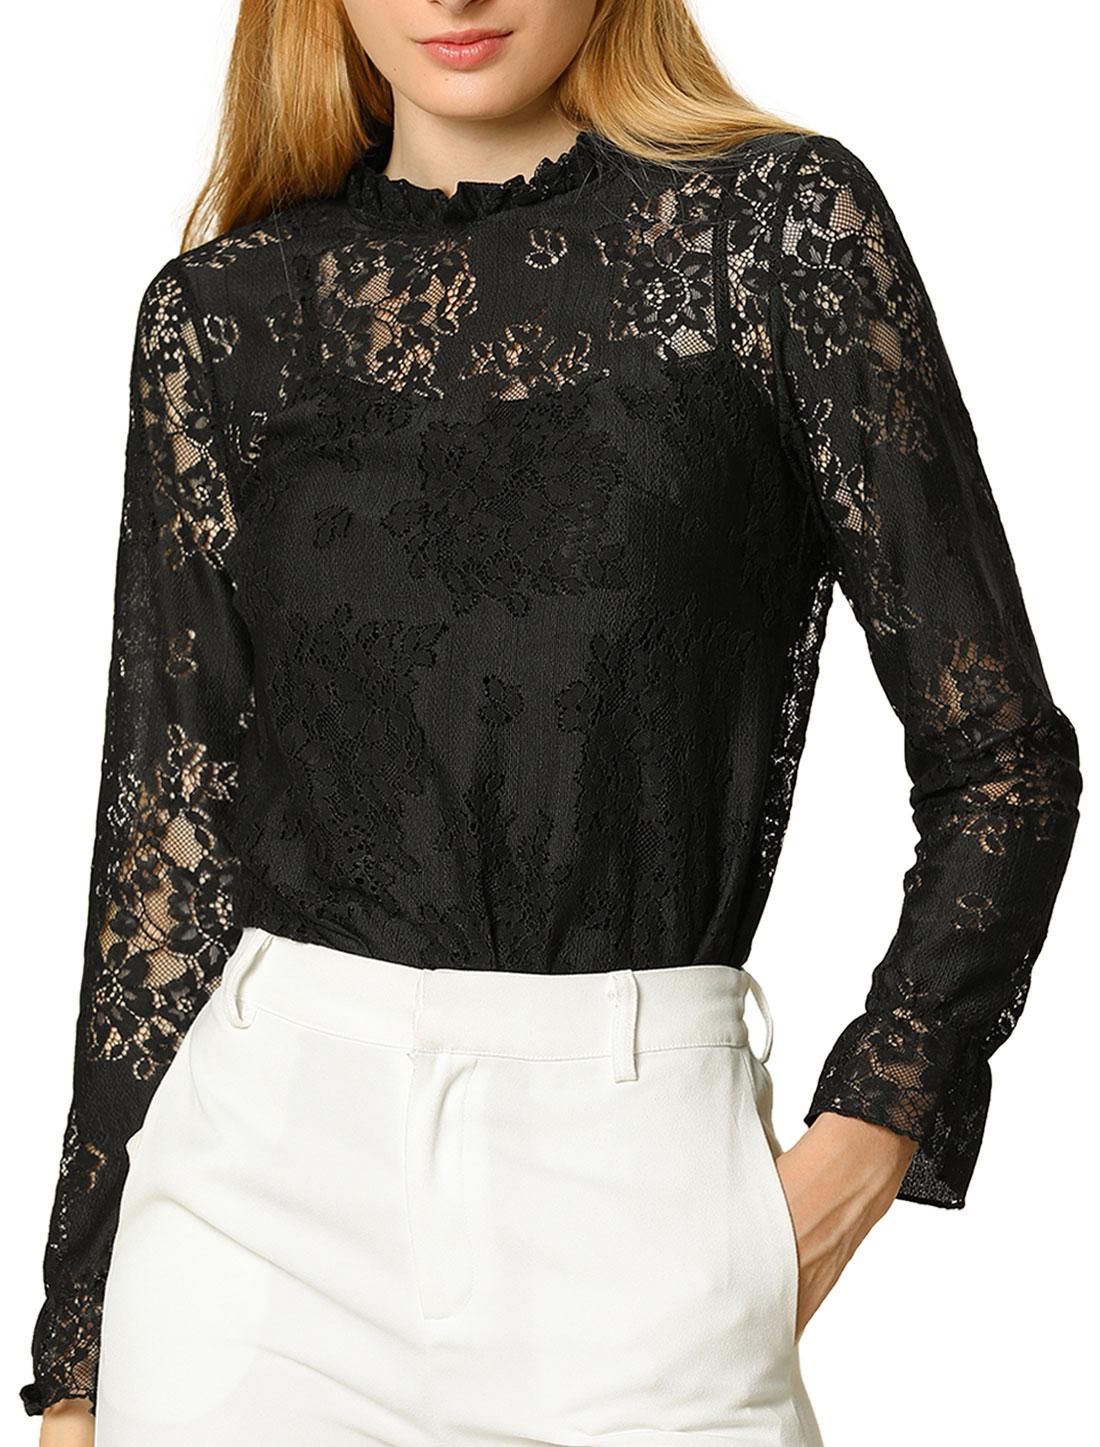 Allegra K Womens Lace Sheer Floral Color Block Blouse Black M (US 10)